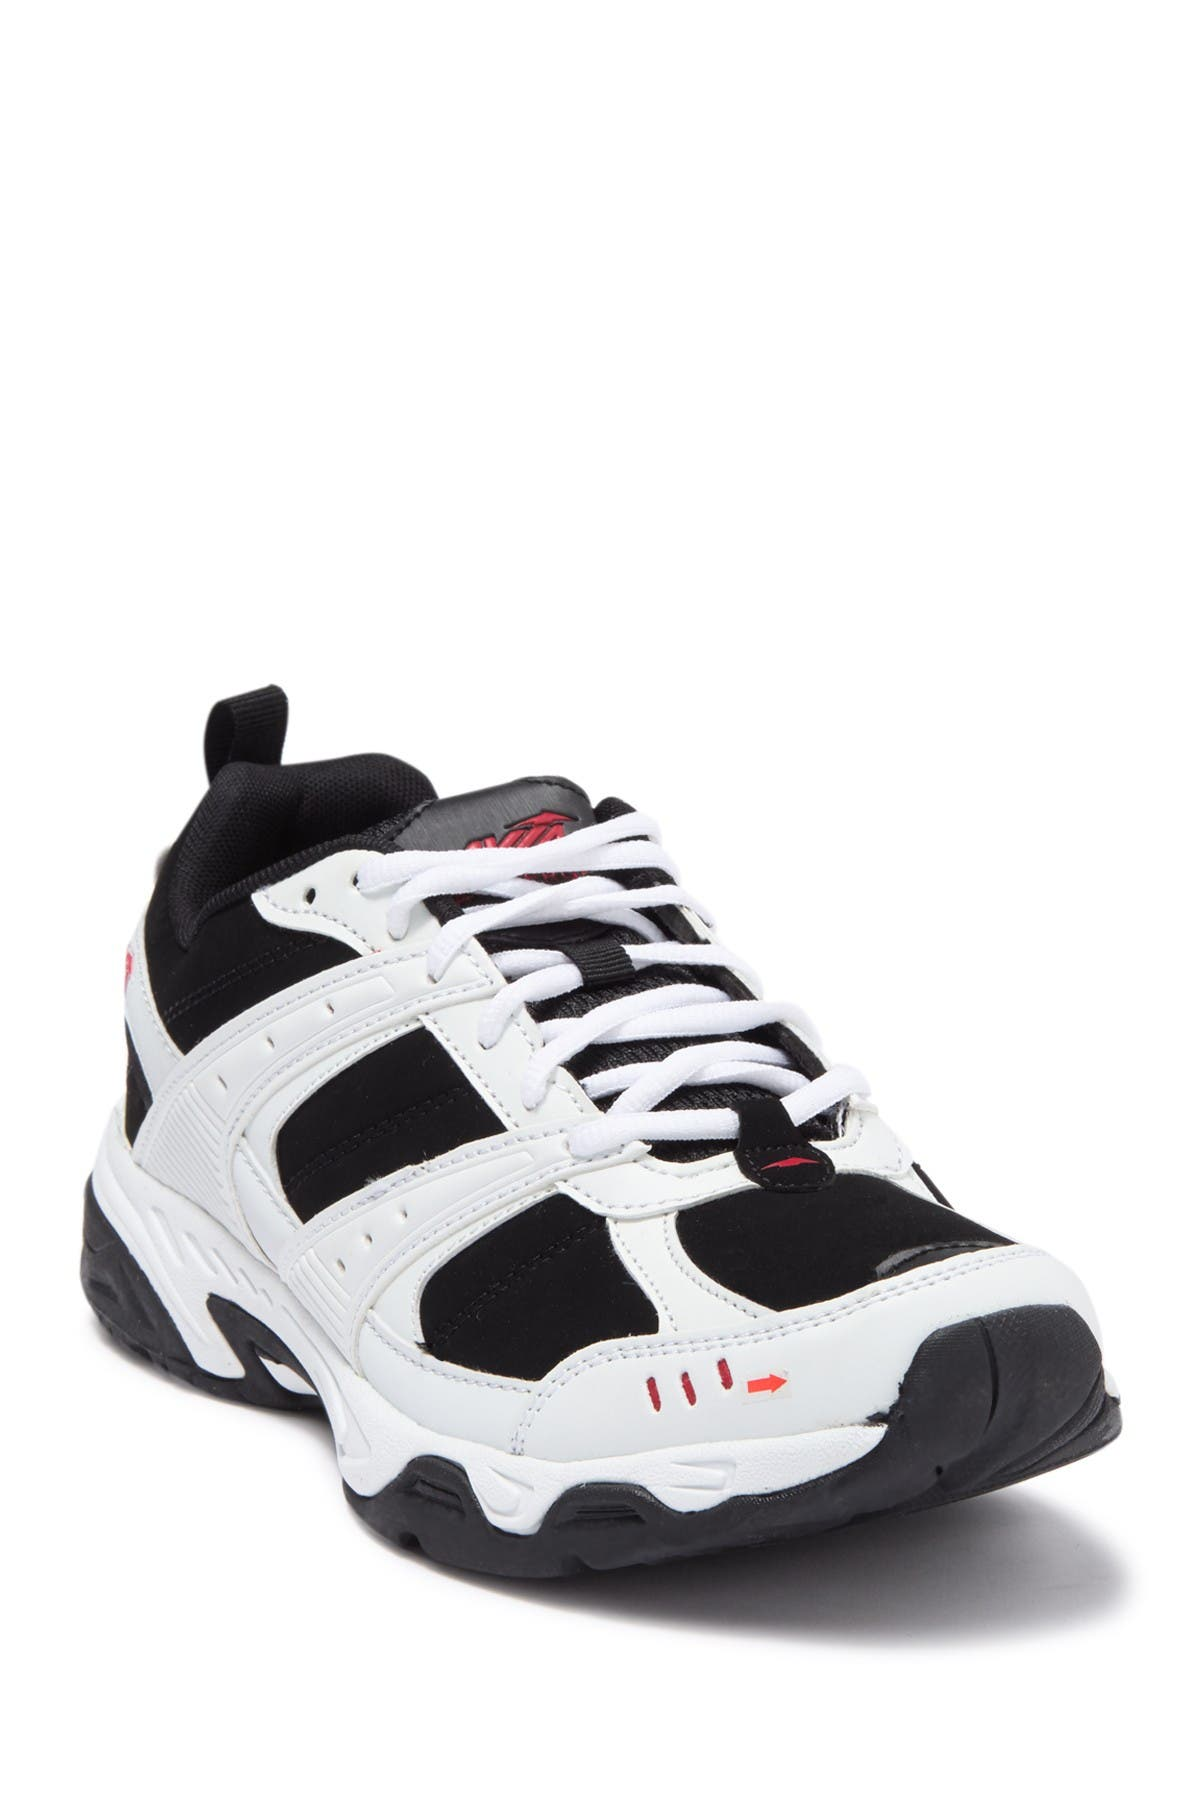 Image of AVIA Verge Training Sneaker